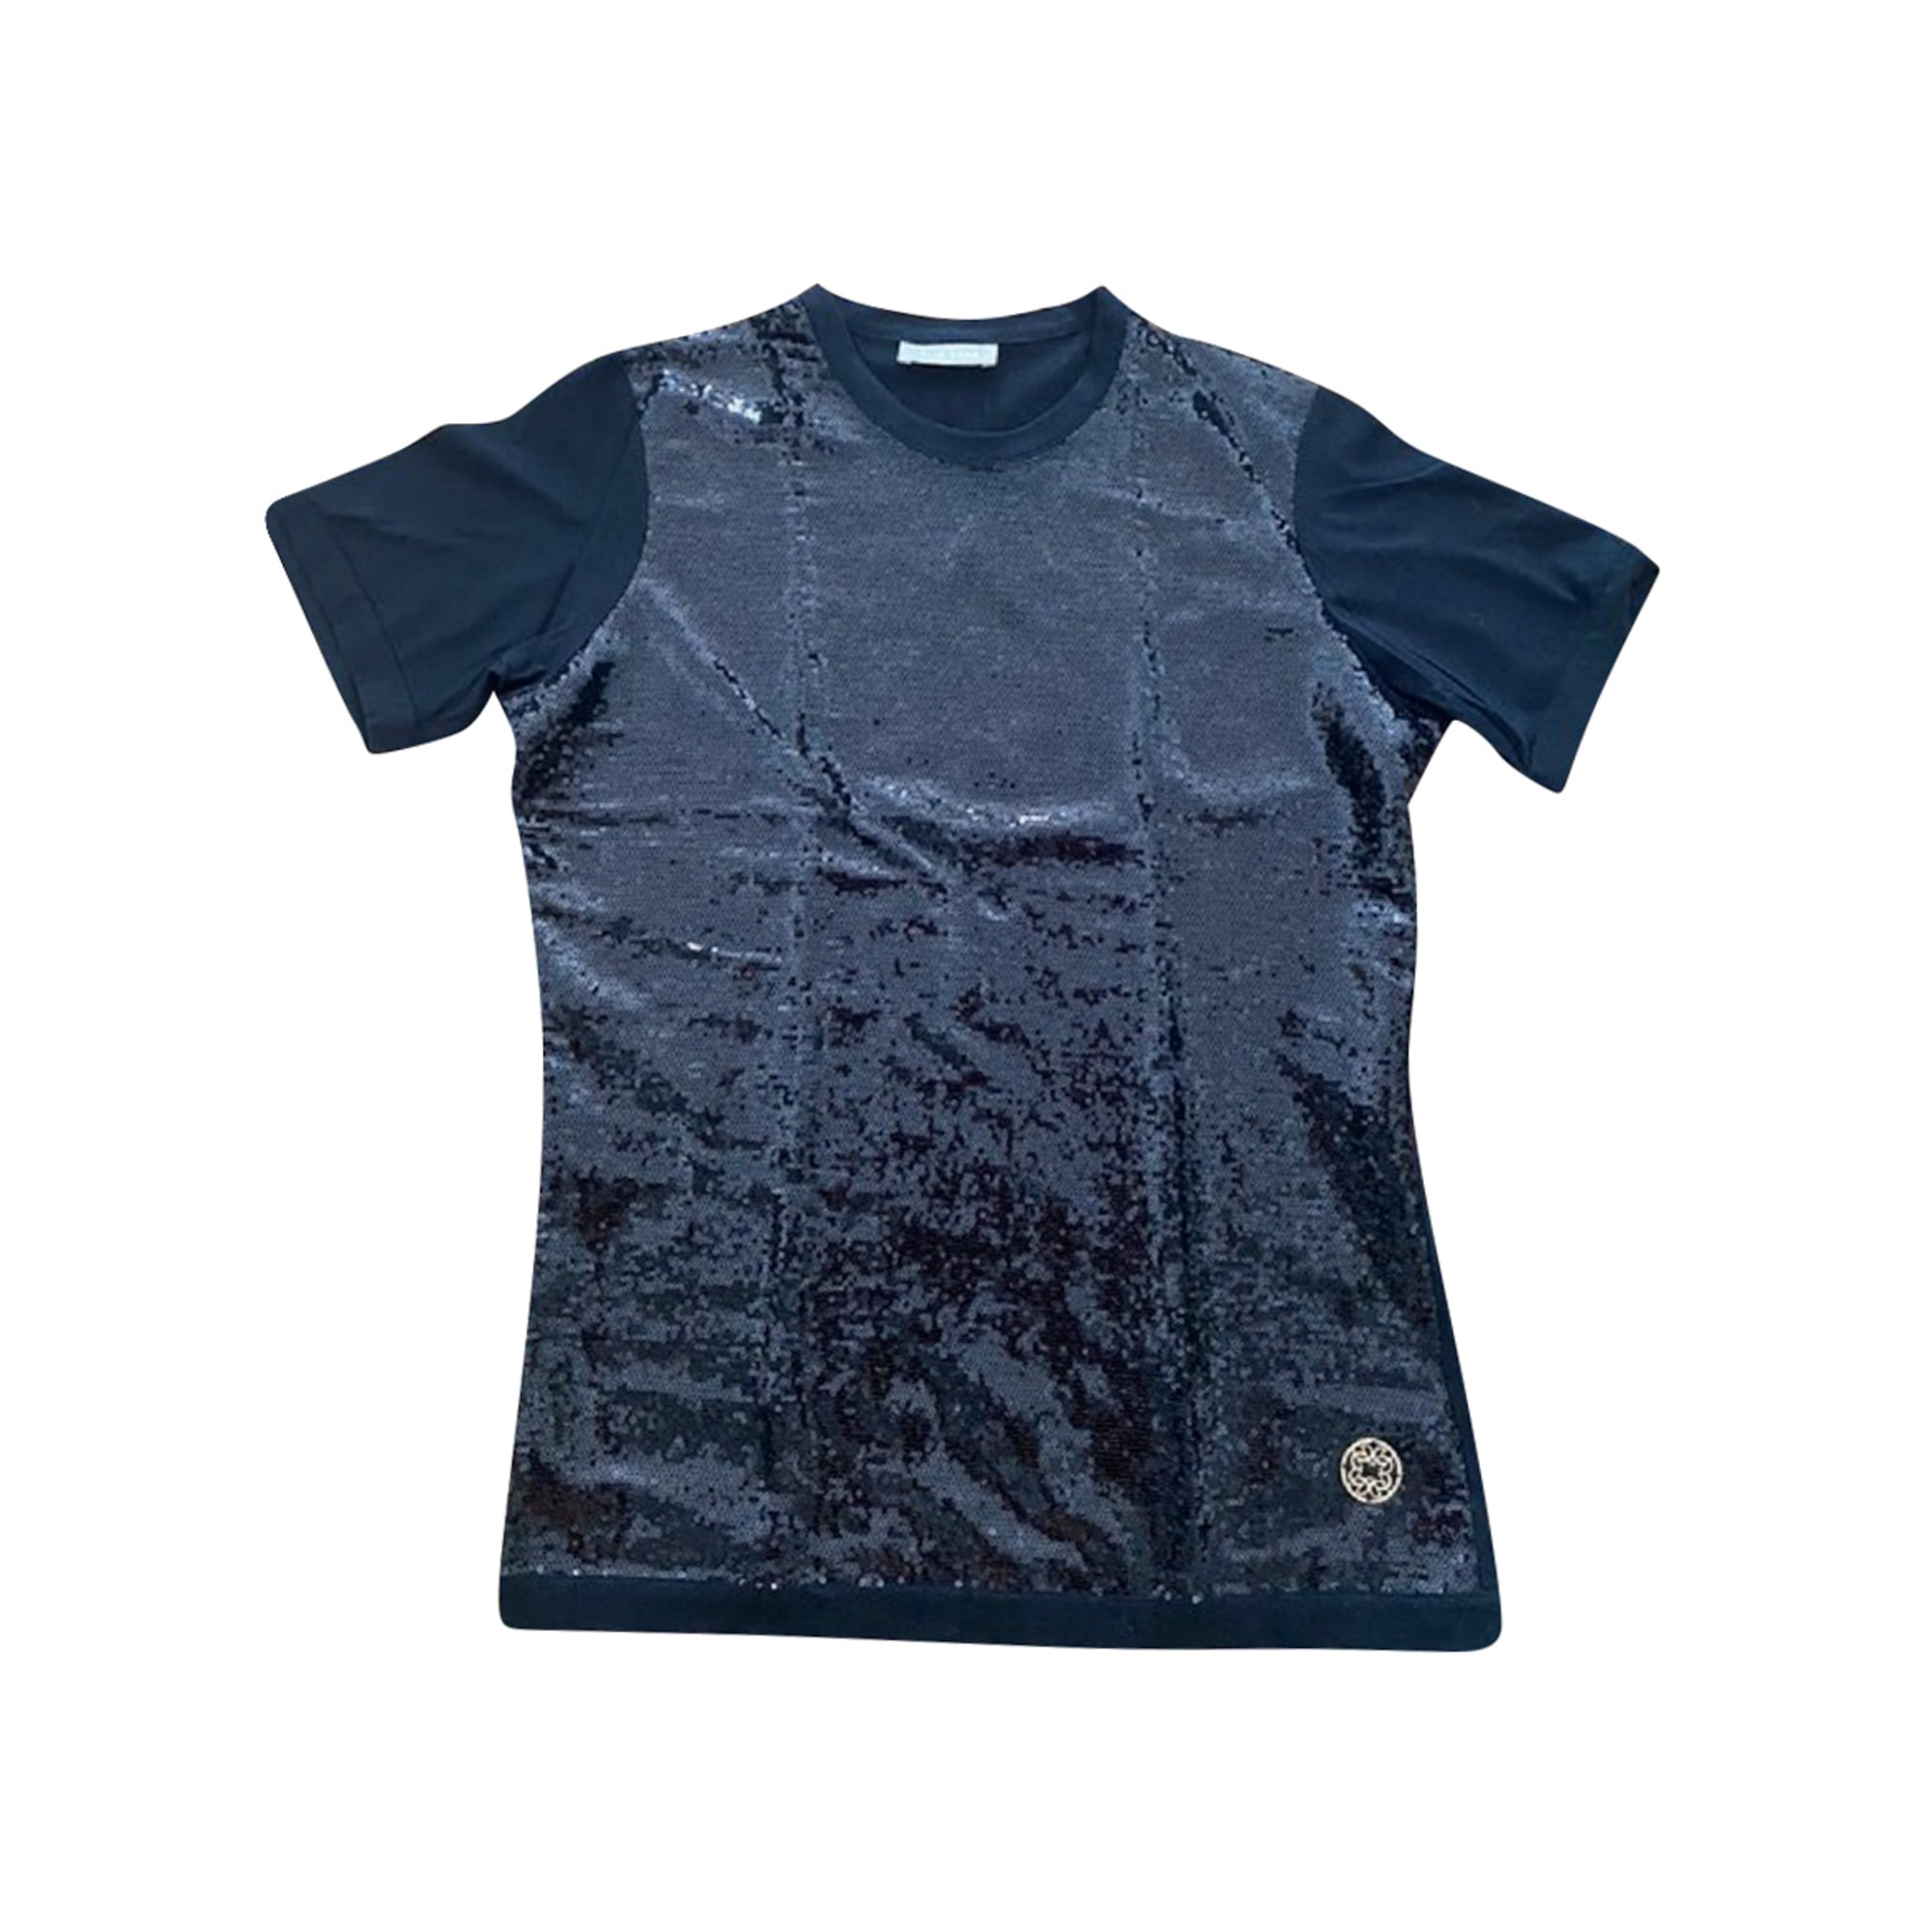 Top, tee-shirt ELIE SAAB Noir